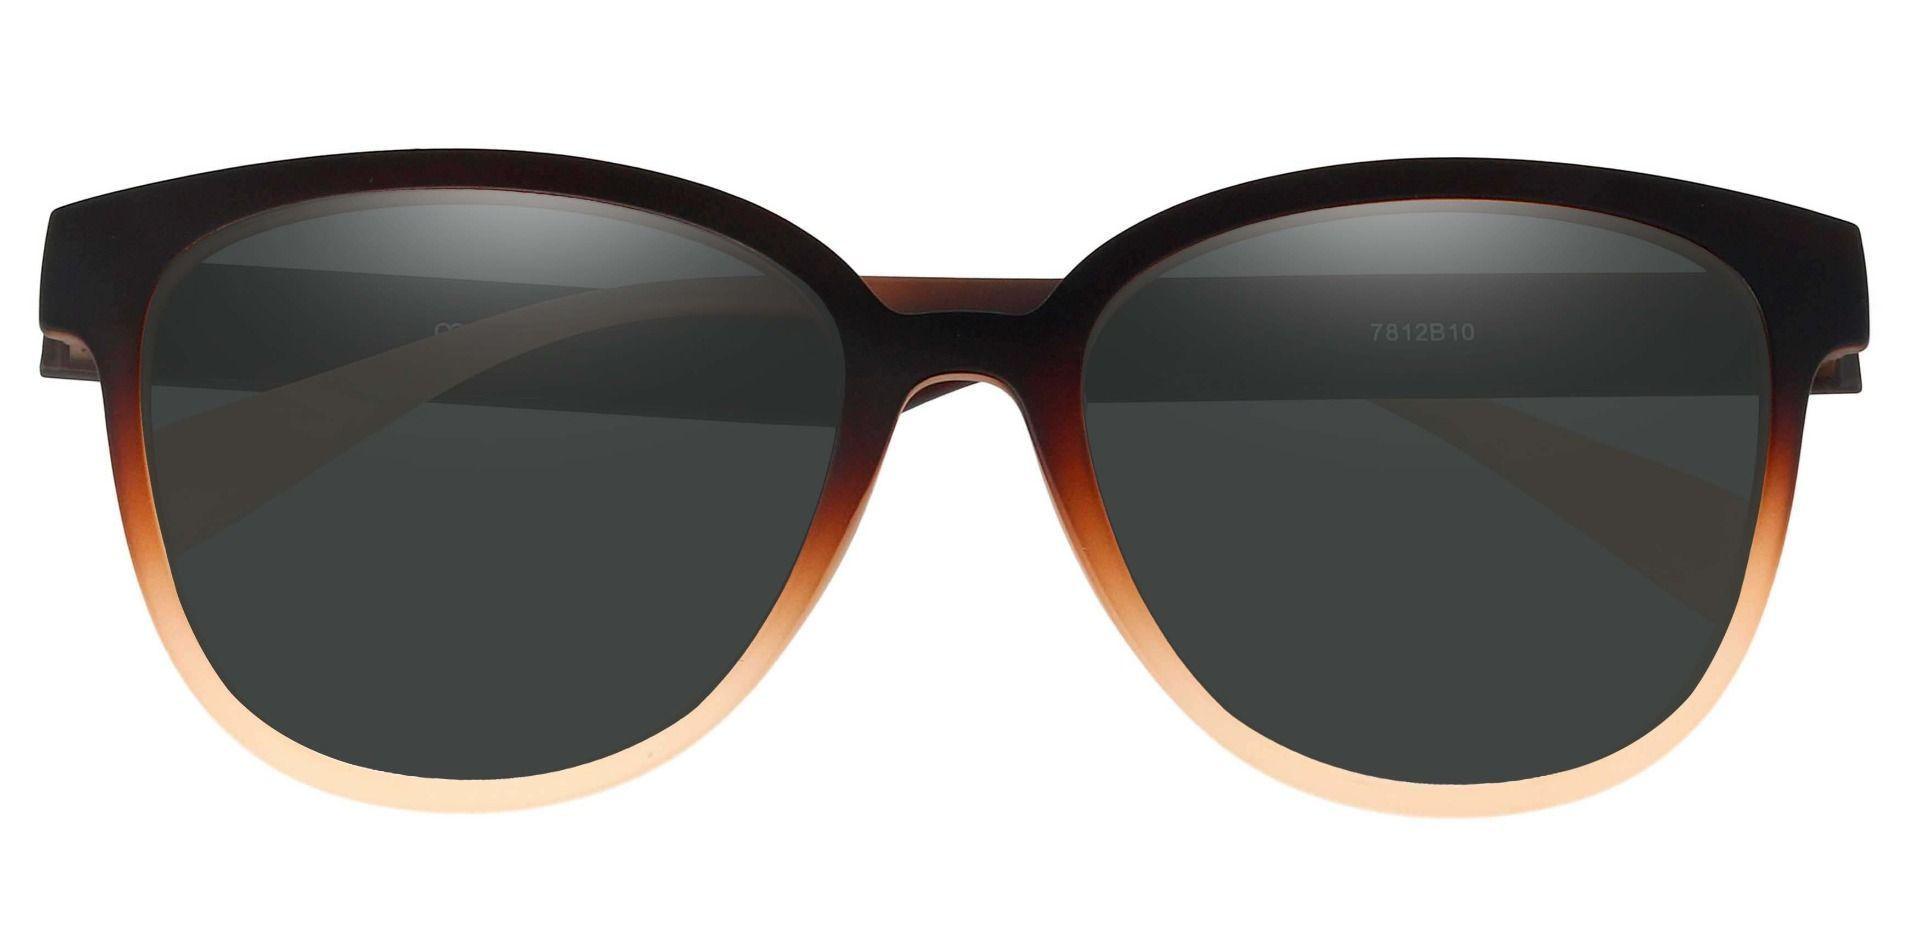 Newport Oval Prescription Sunglasses - Brown Frame With Gray Lenses